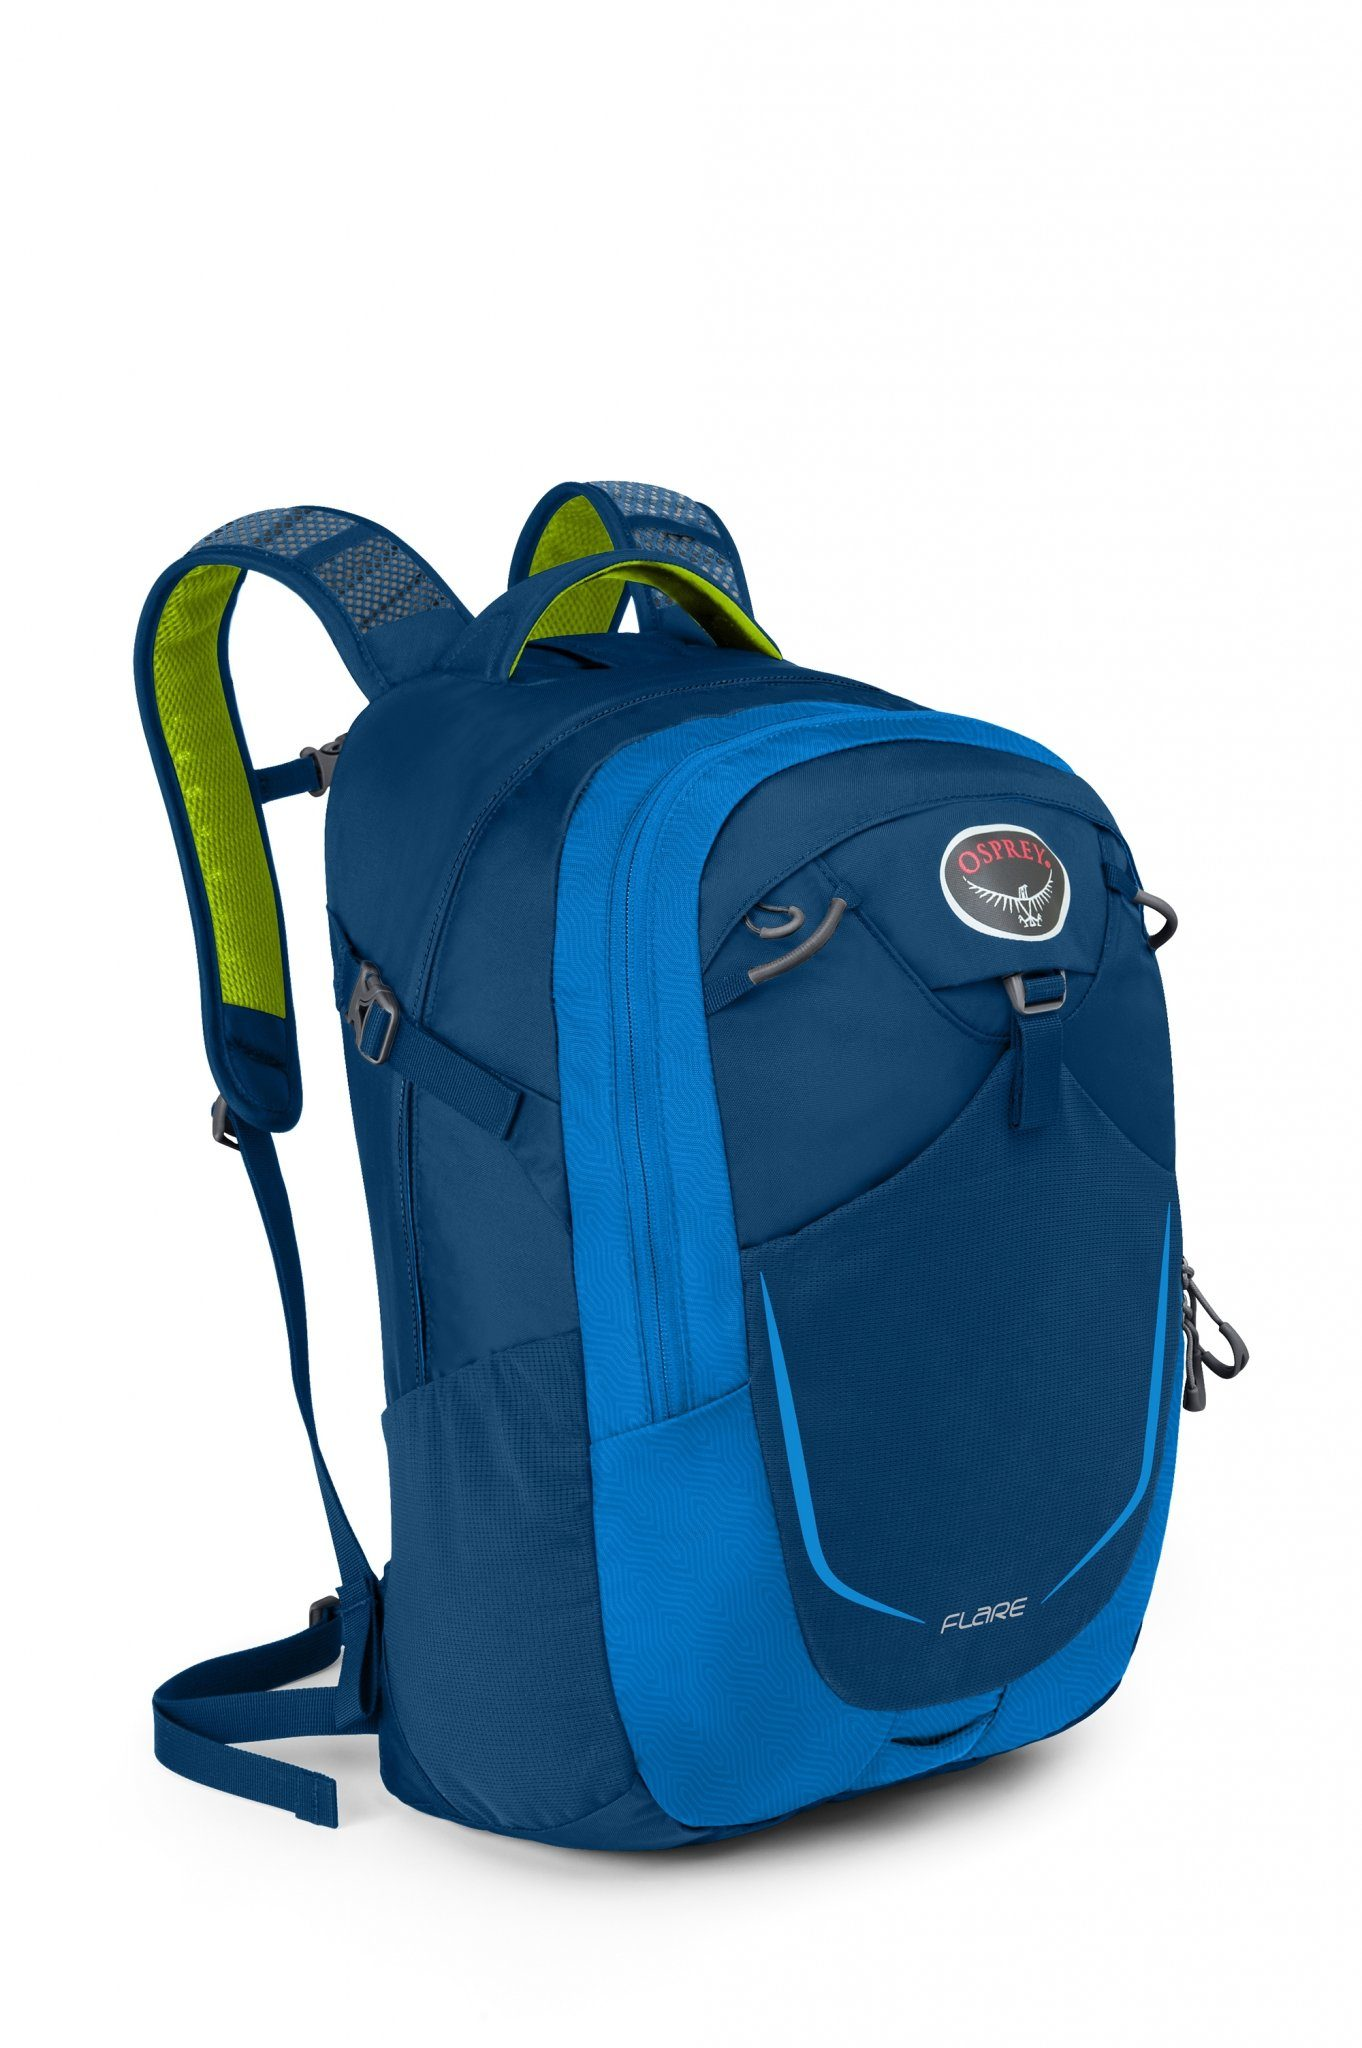 Osprey Wanderrucksack »Flare 22 Backpack«